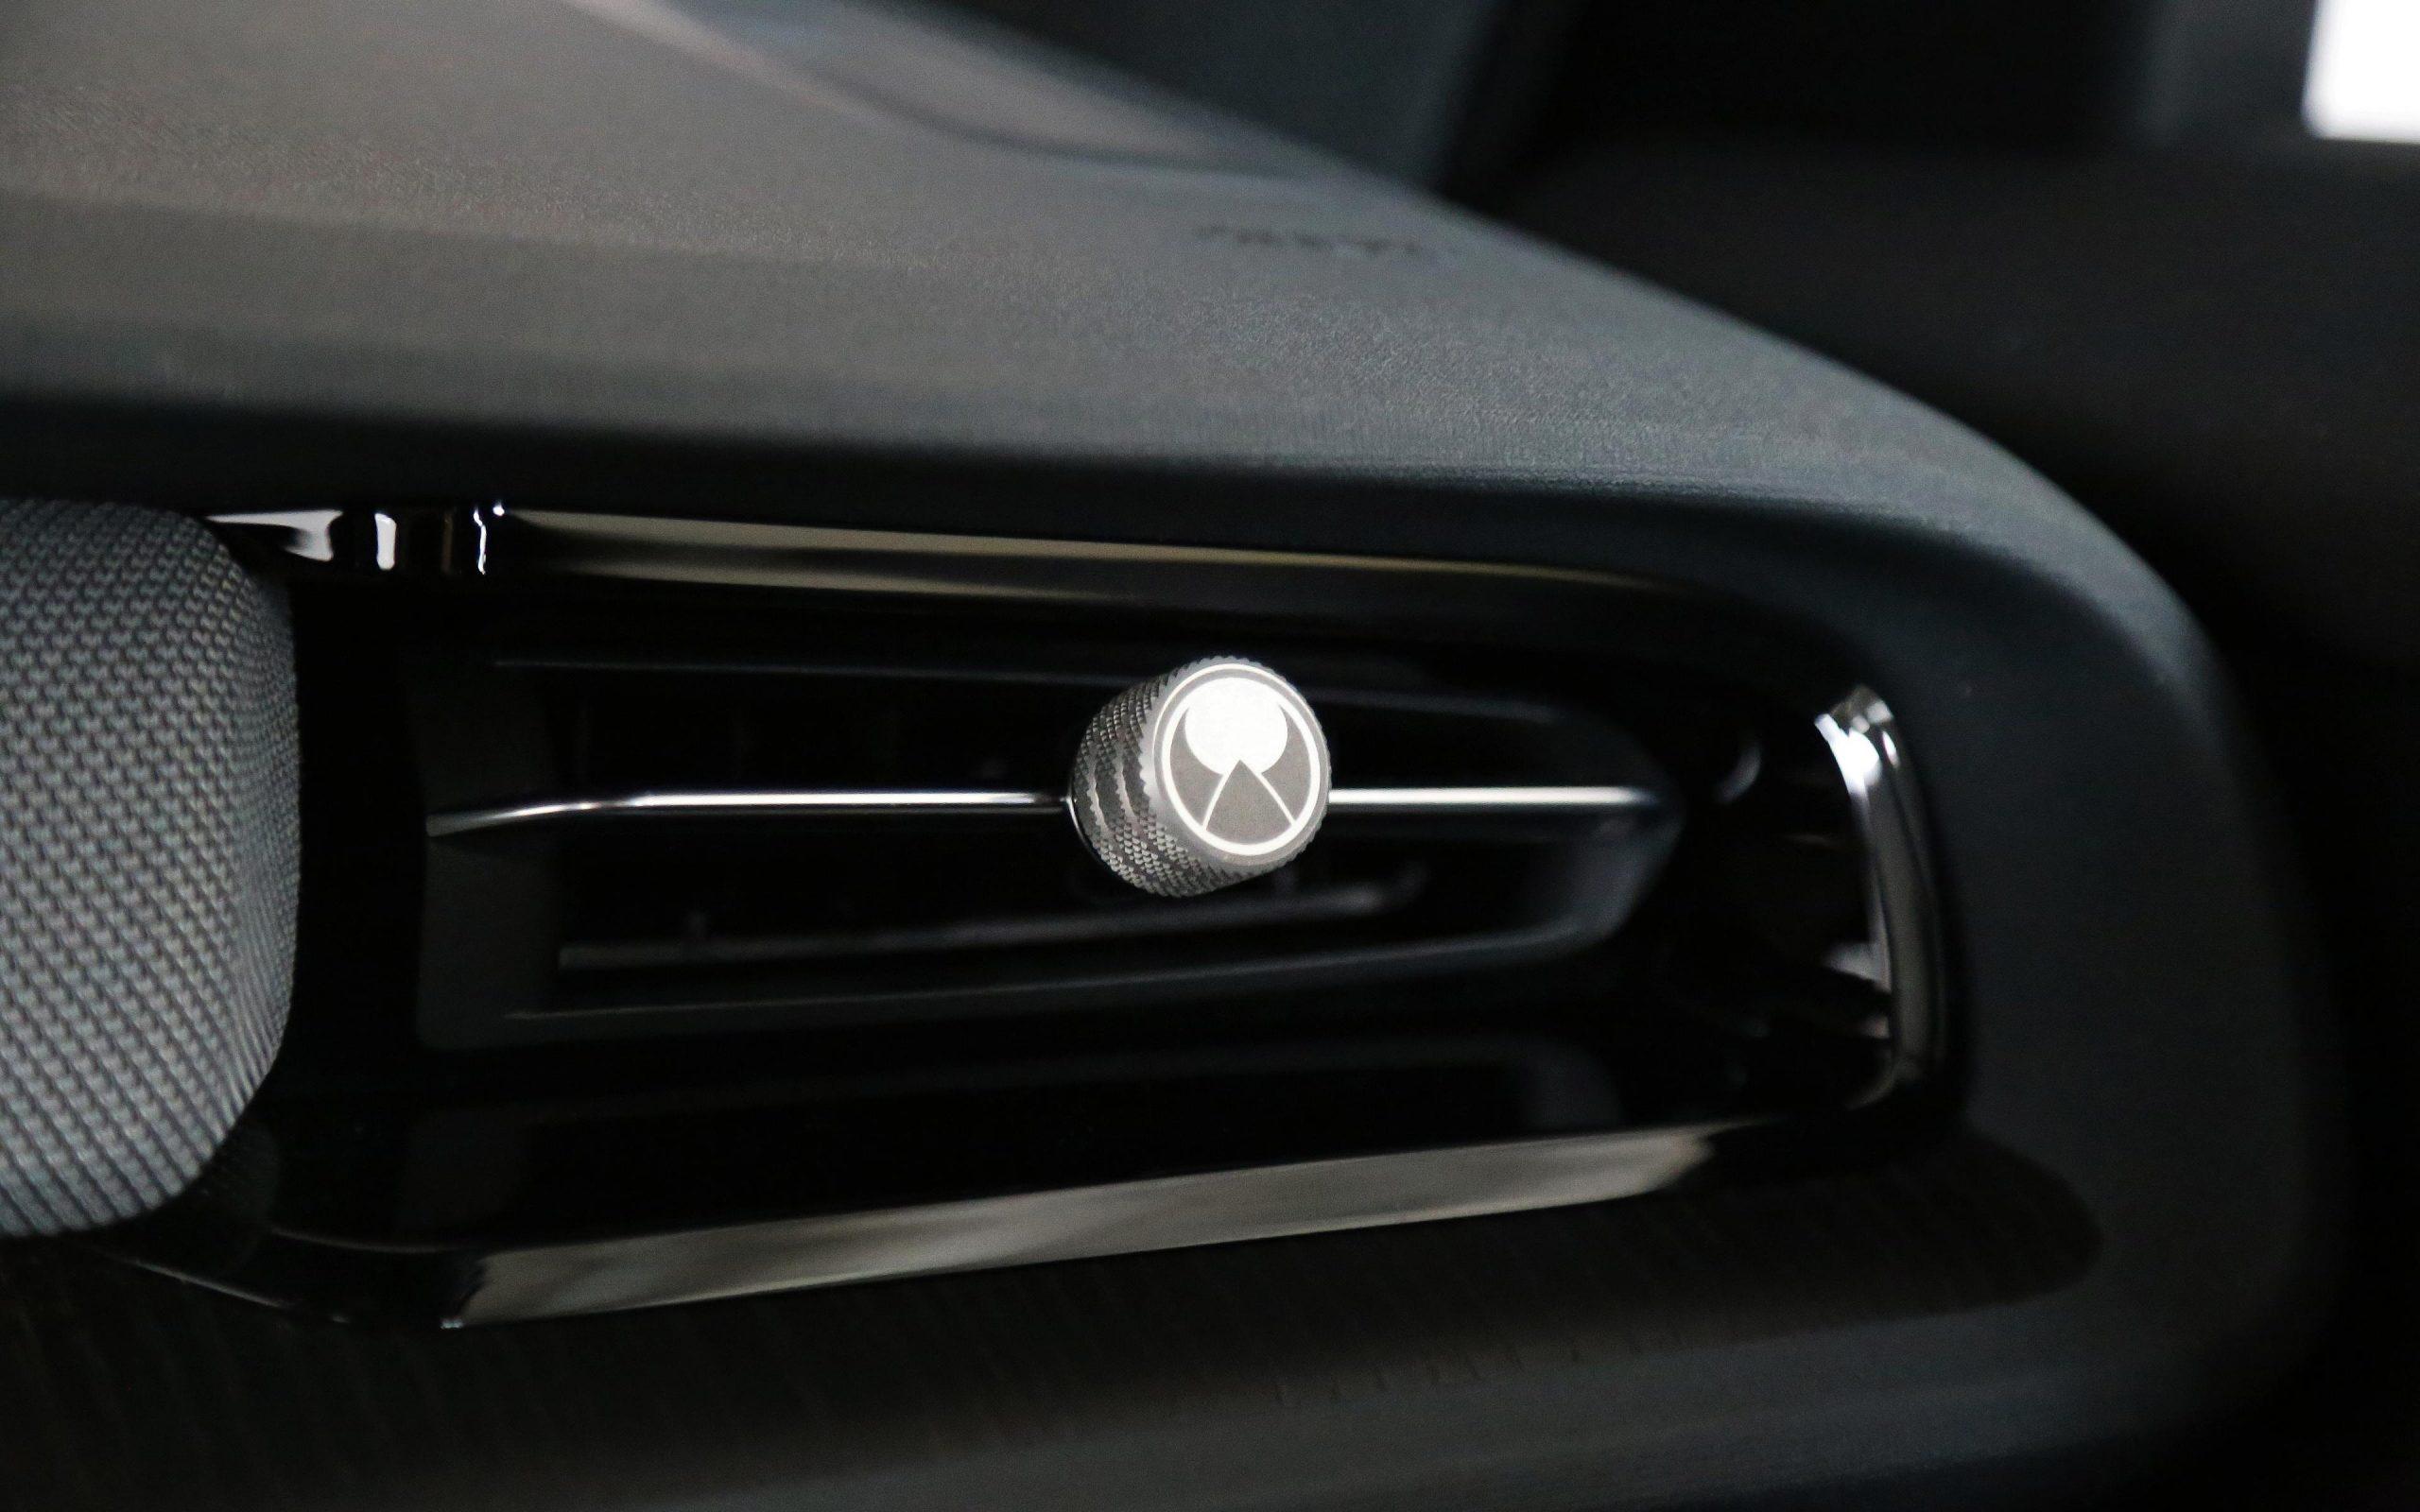 heico-sportiv-alu-ventilation-nozzles-knobs-polestar-1_1